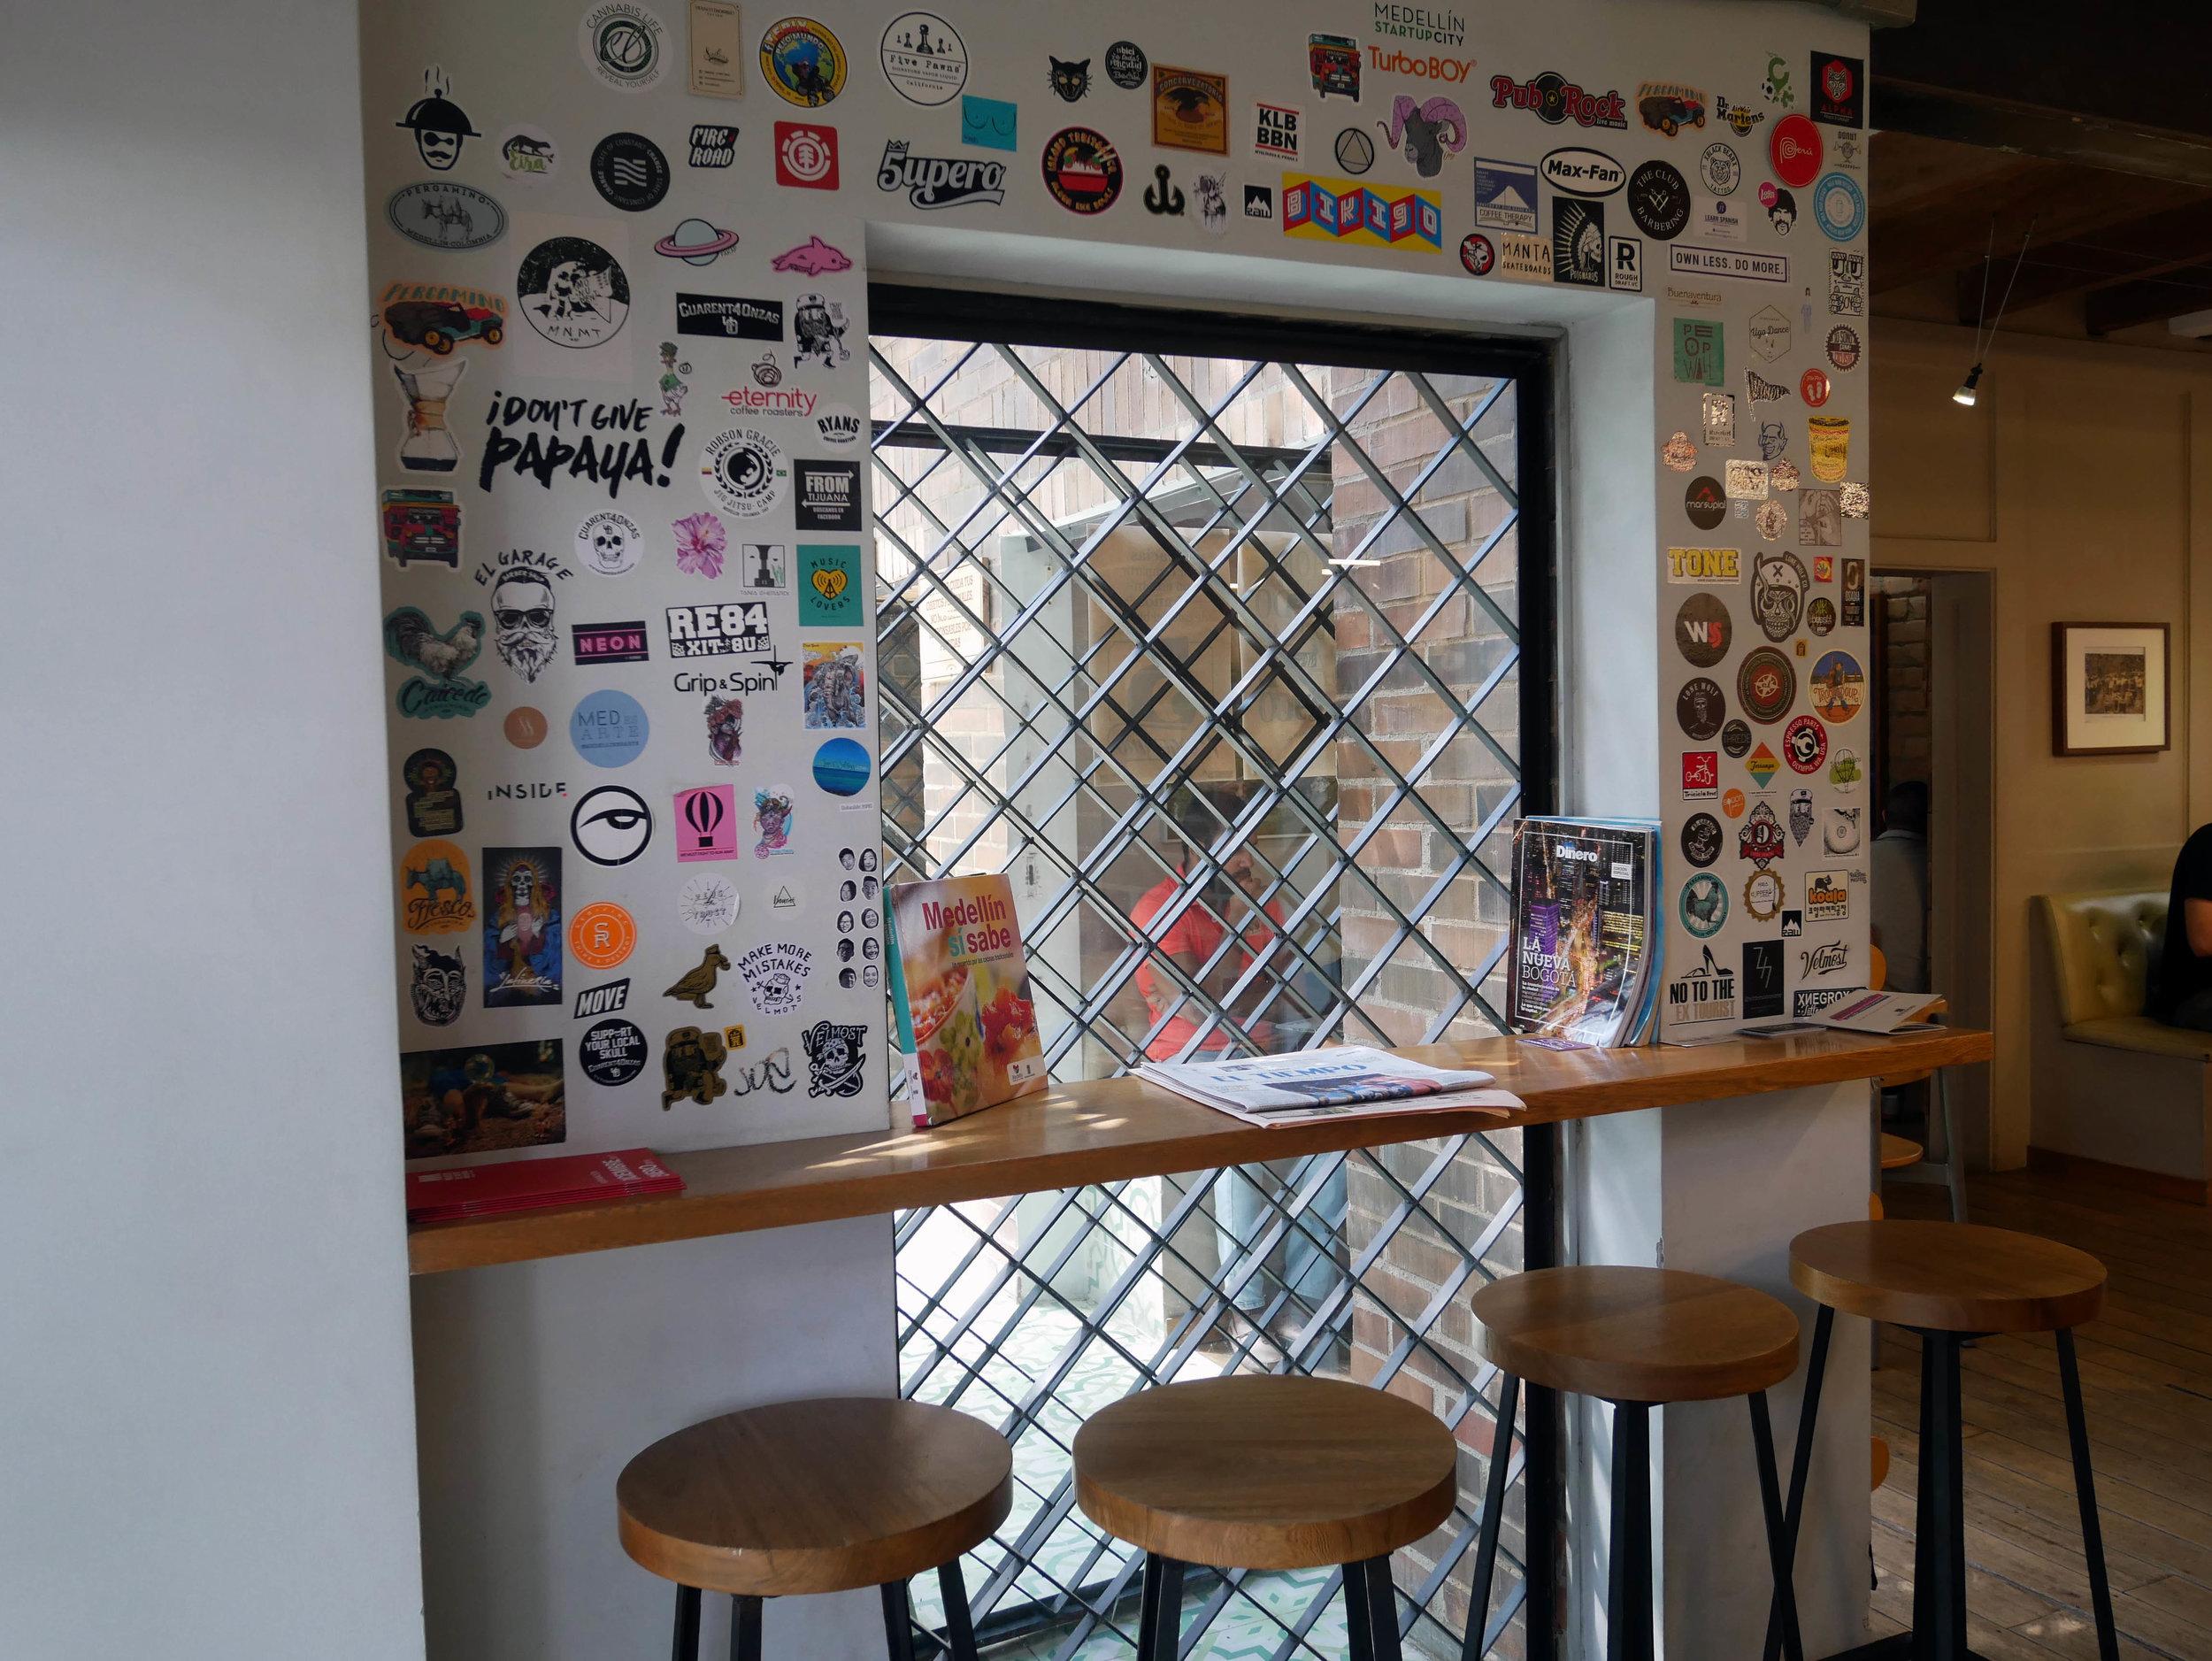 Pergamino coffee interiors and seating